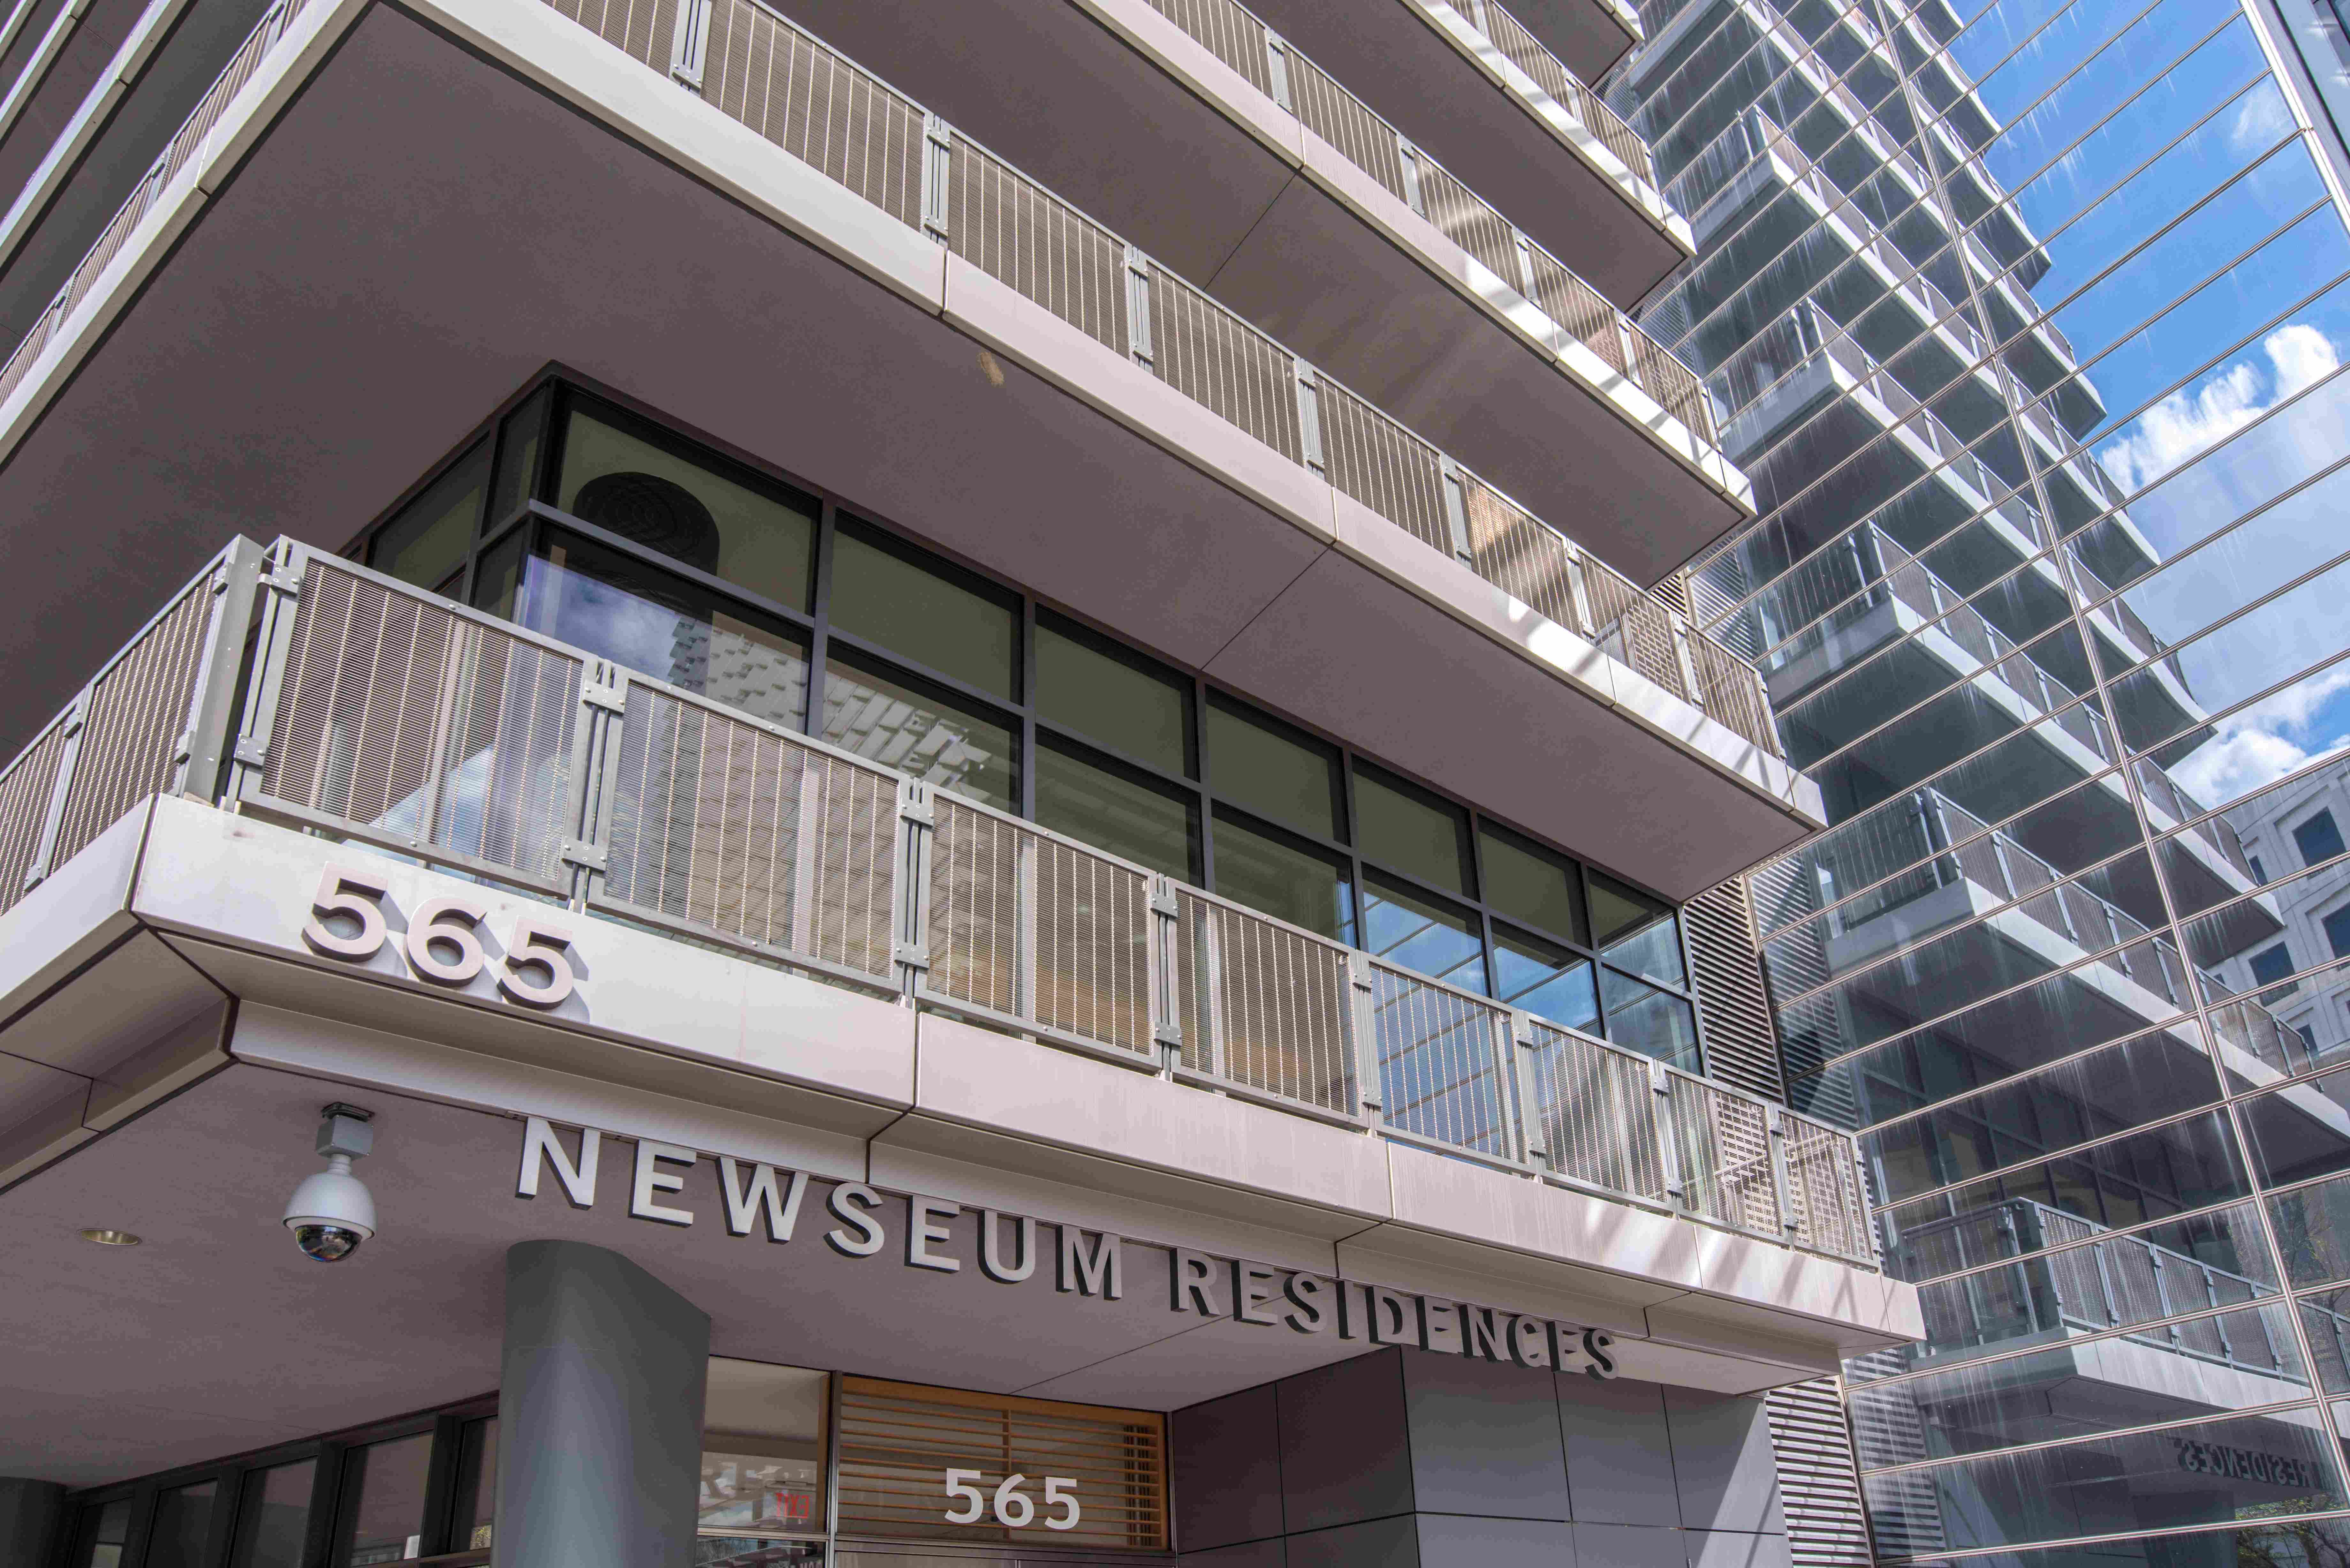 Newseum Residences